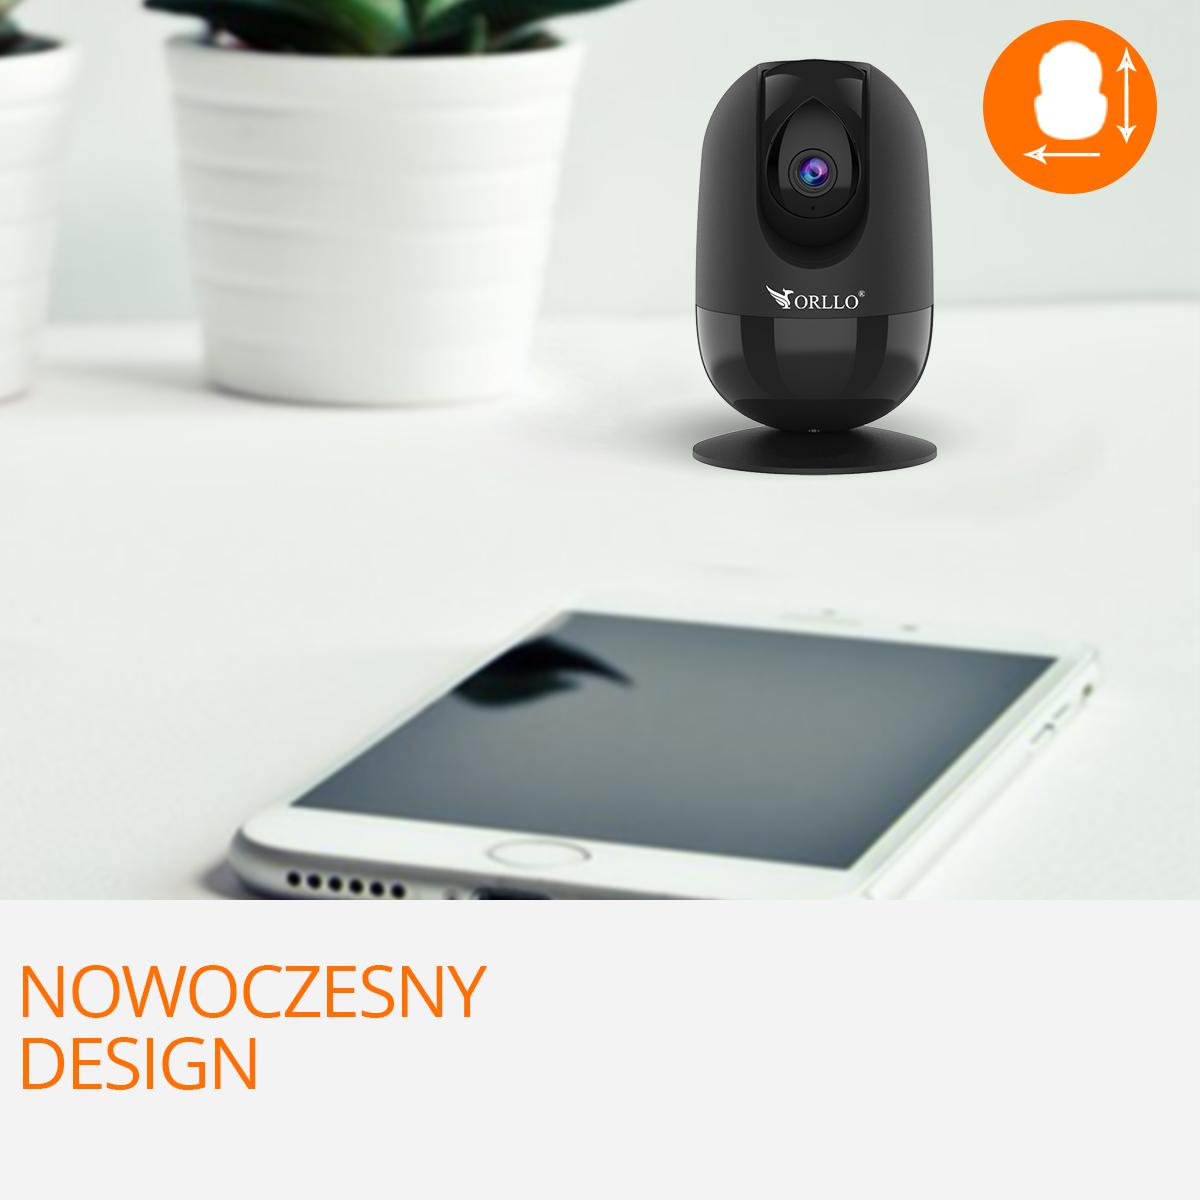 mini kamera wewnetrzna monitoring orllo-pl